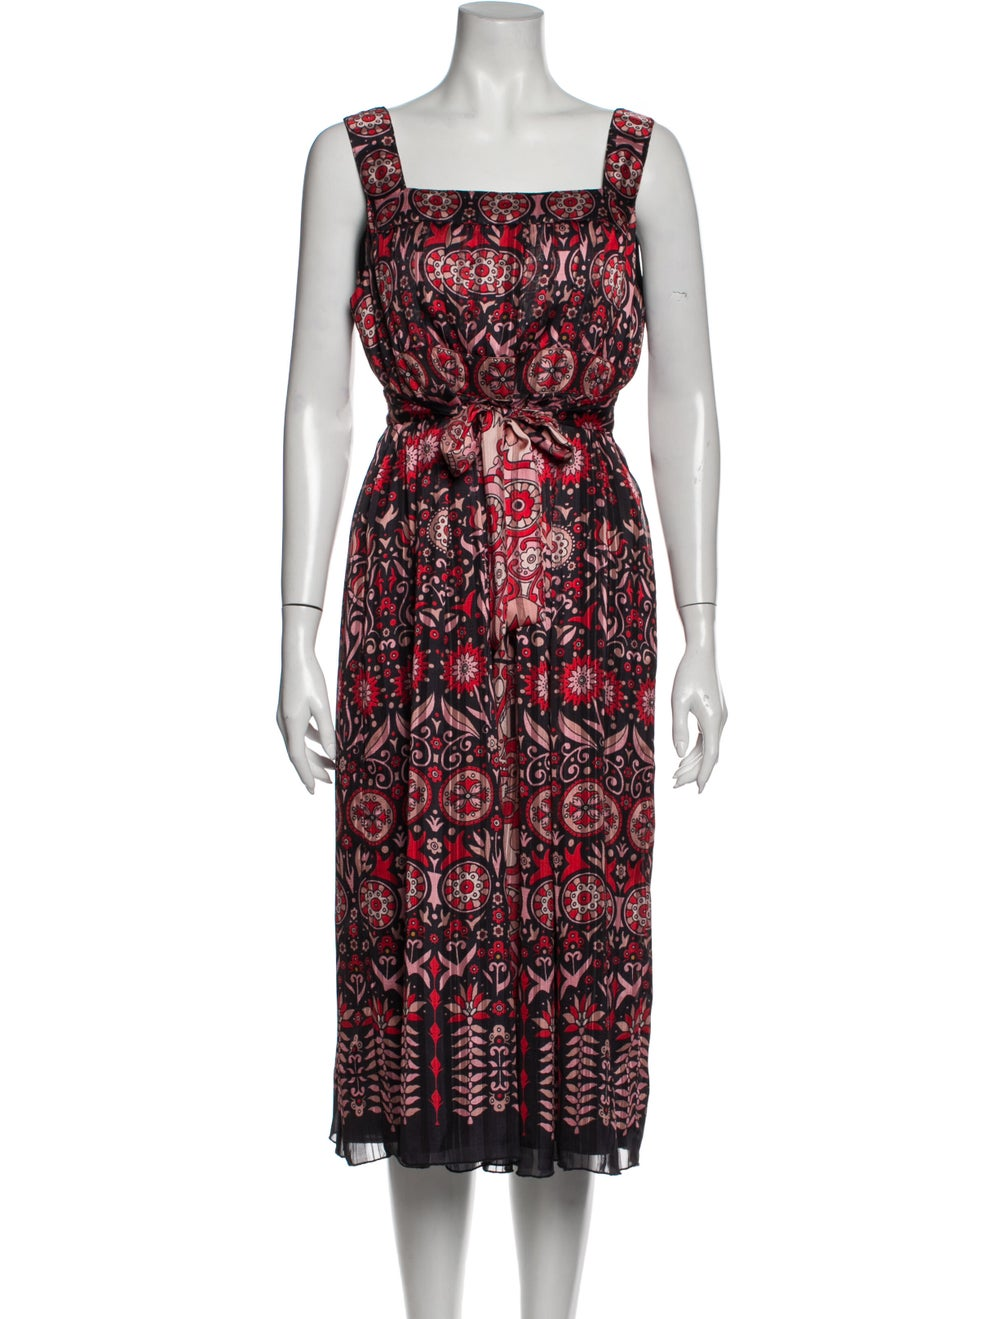 Anna Sui Vintage Midi Length Dress Red - image 1